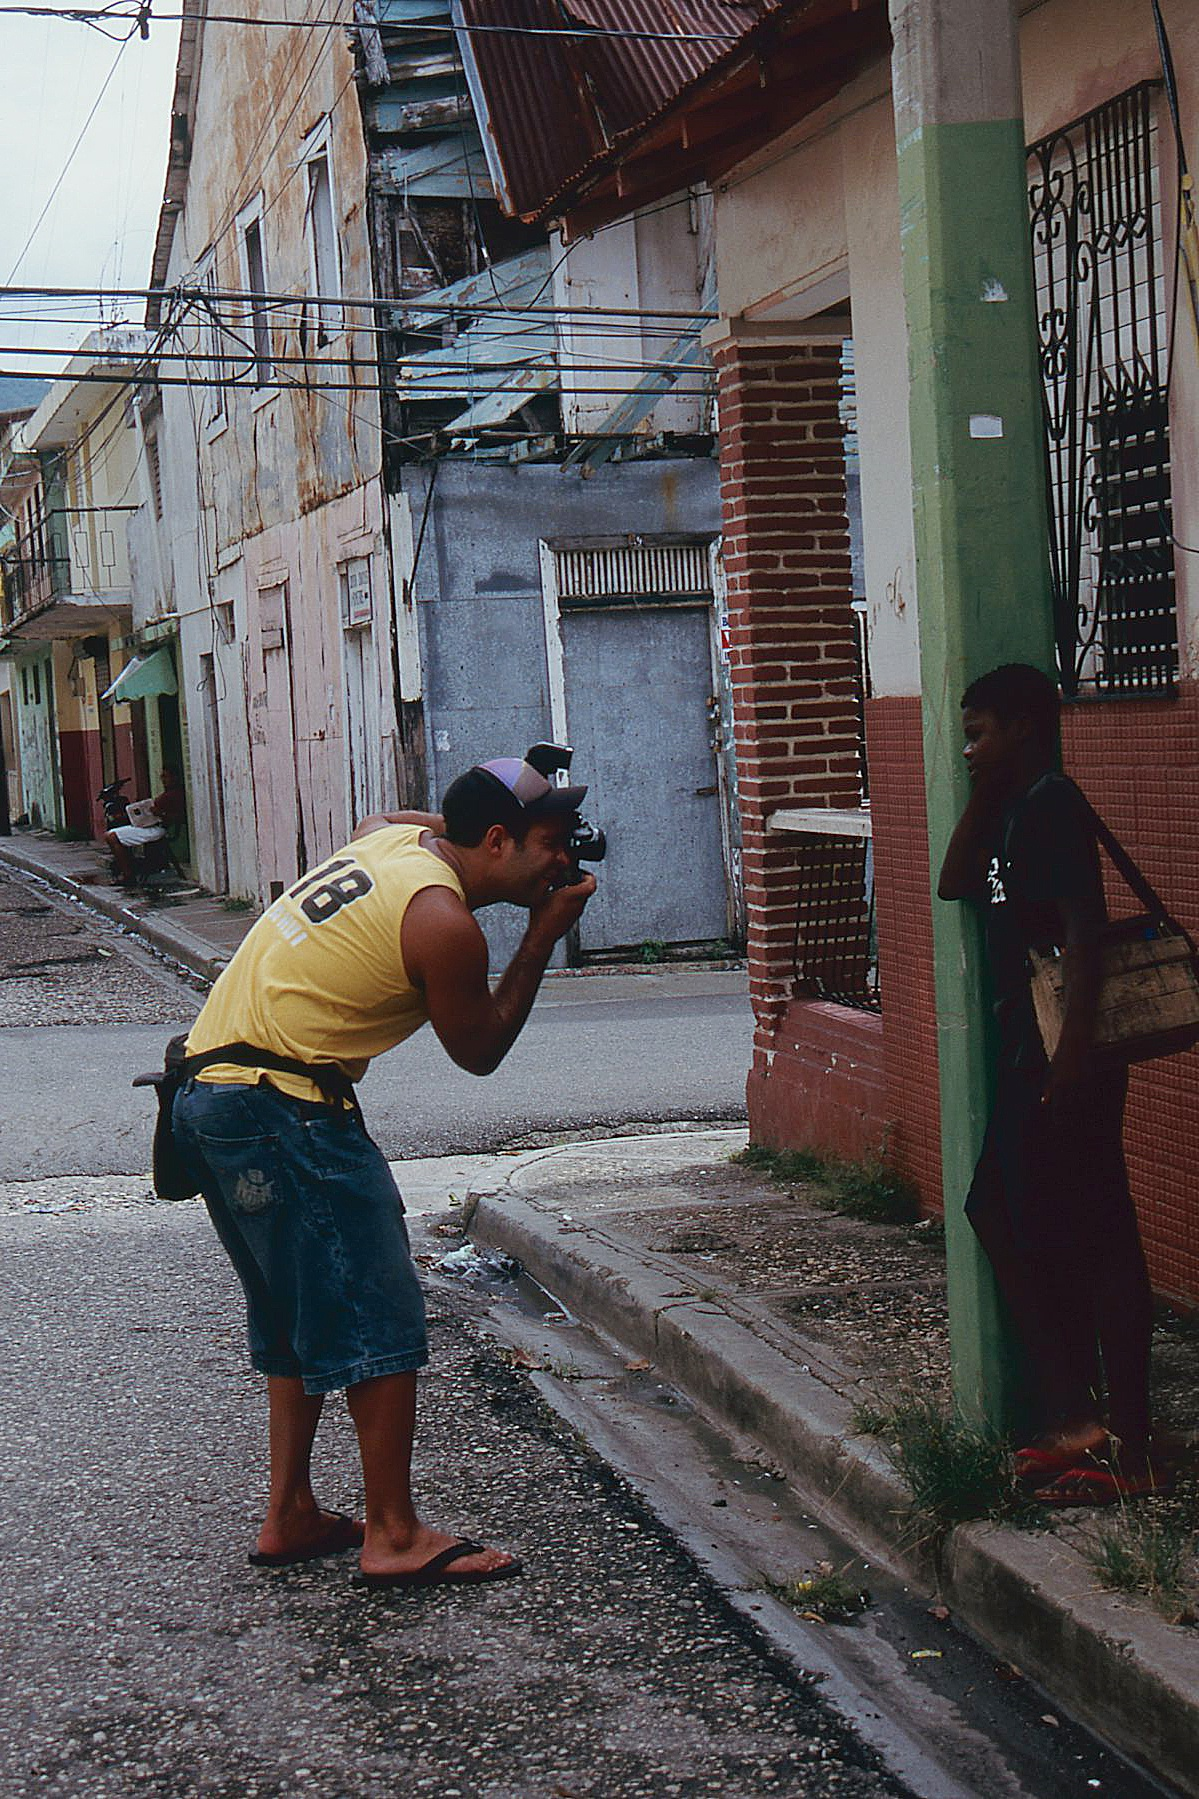 República Dominicana. Foto _ Mery Barrios - Behind the lens - JOSE V. GLEZ